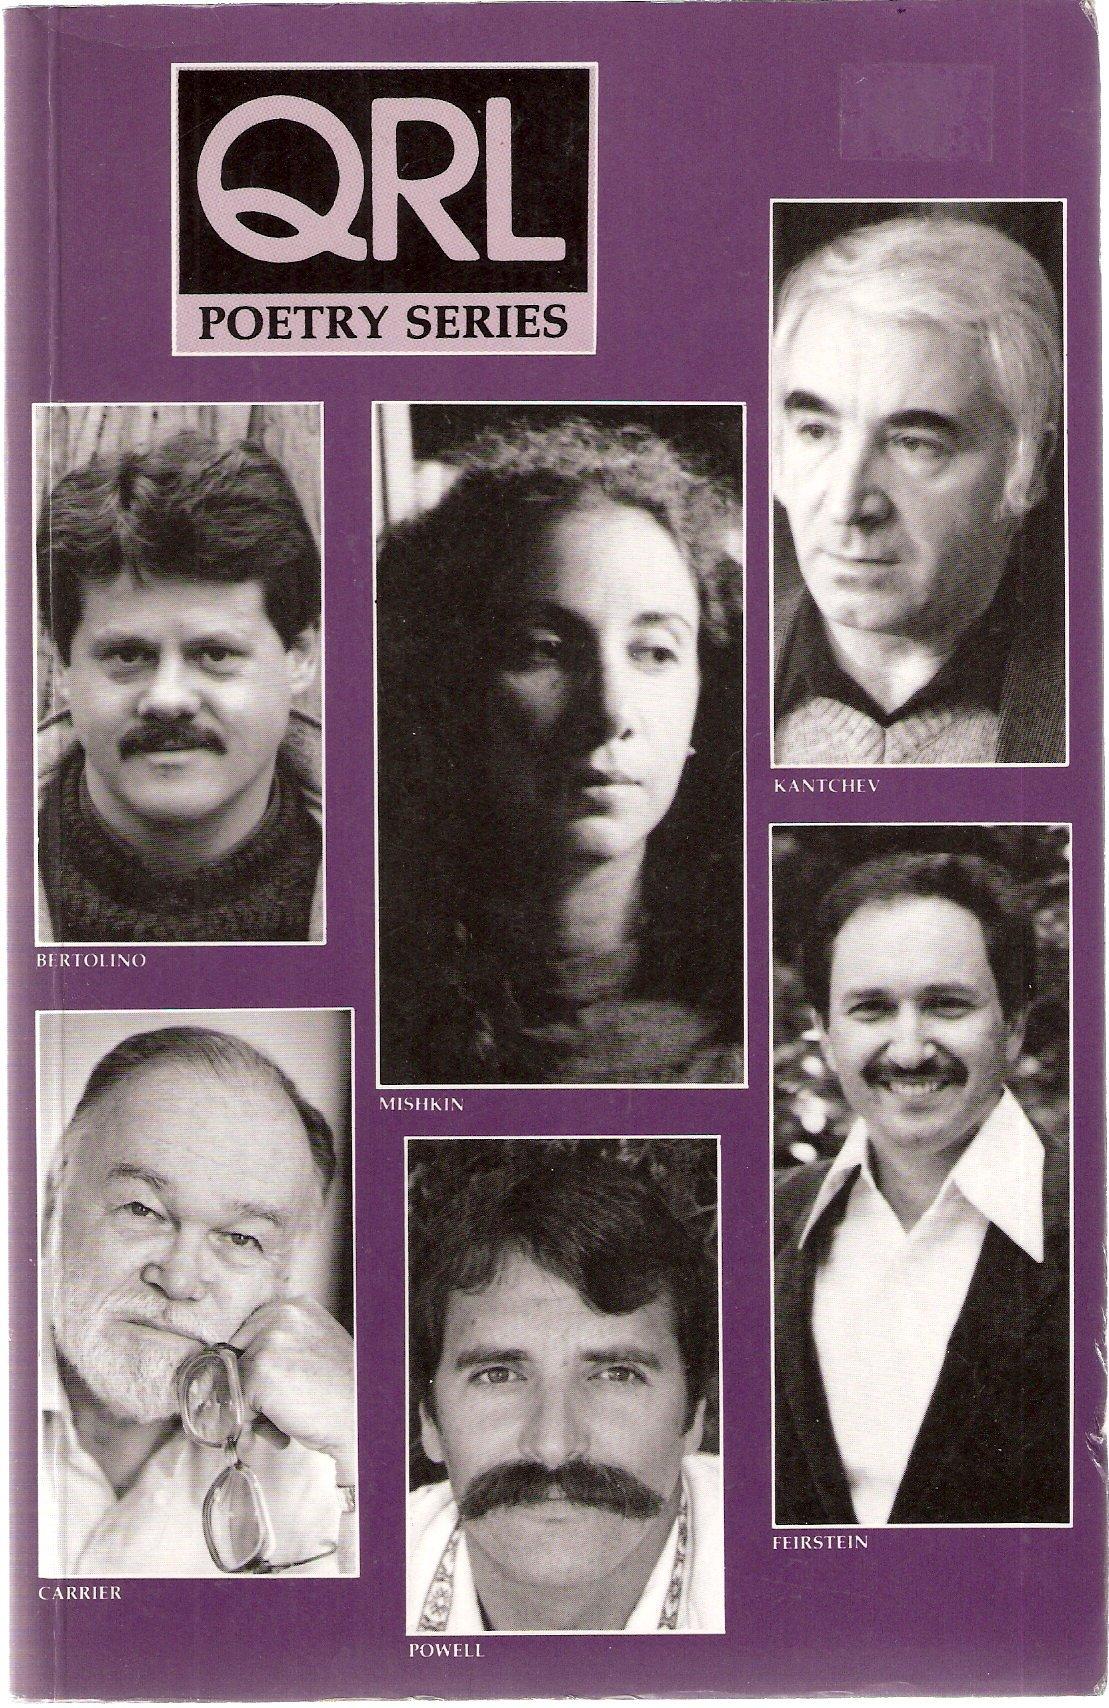 Contemporary Poetry Series VII (QRL Poetry Series [Quarterly Review of Literature], Vol. XXVI), Warren Carrier; James Bertolino; Nikolai Kantchev; Julia Mishkin; Frederick Feirstein; Joseph Powell